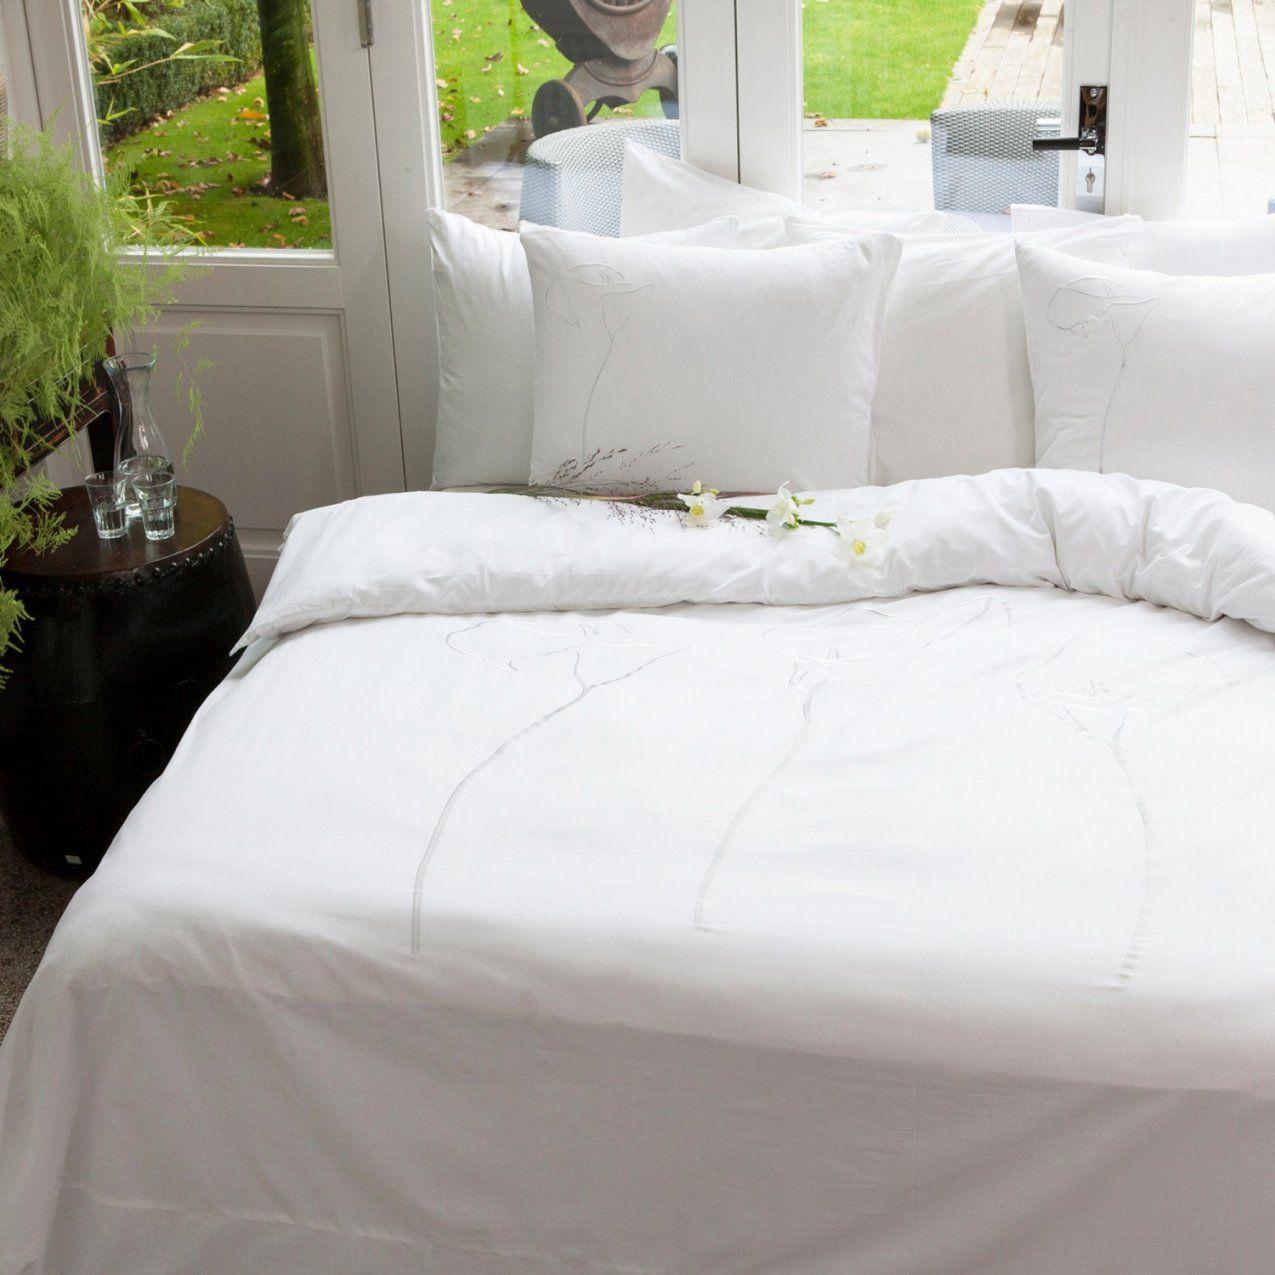 perkal bettw sche b gelfrei haus design ideen. Black Bedroom Furniture Sets. Home Design Ideas